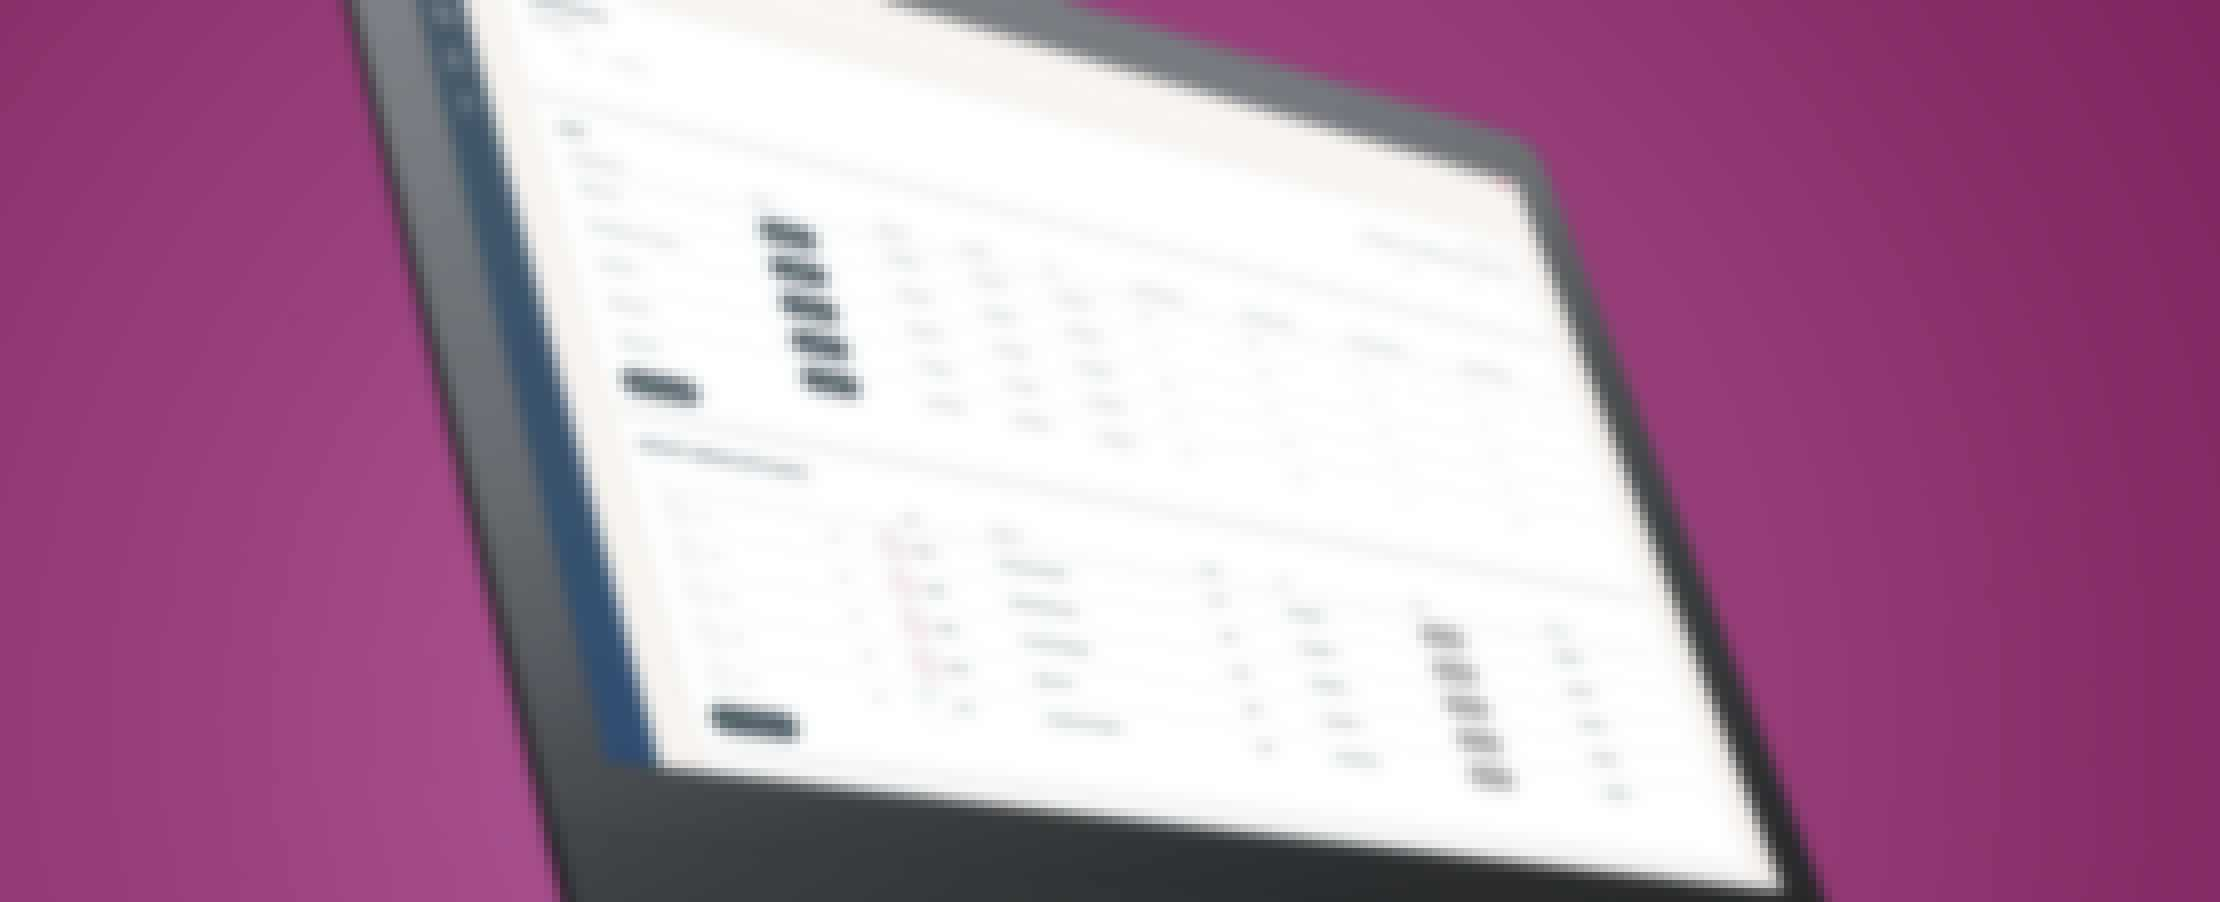 DataByte by Luminos Software